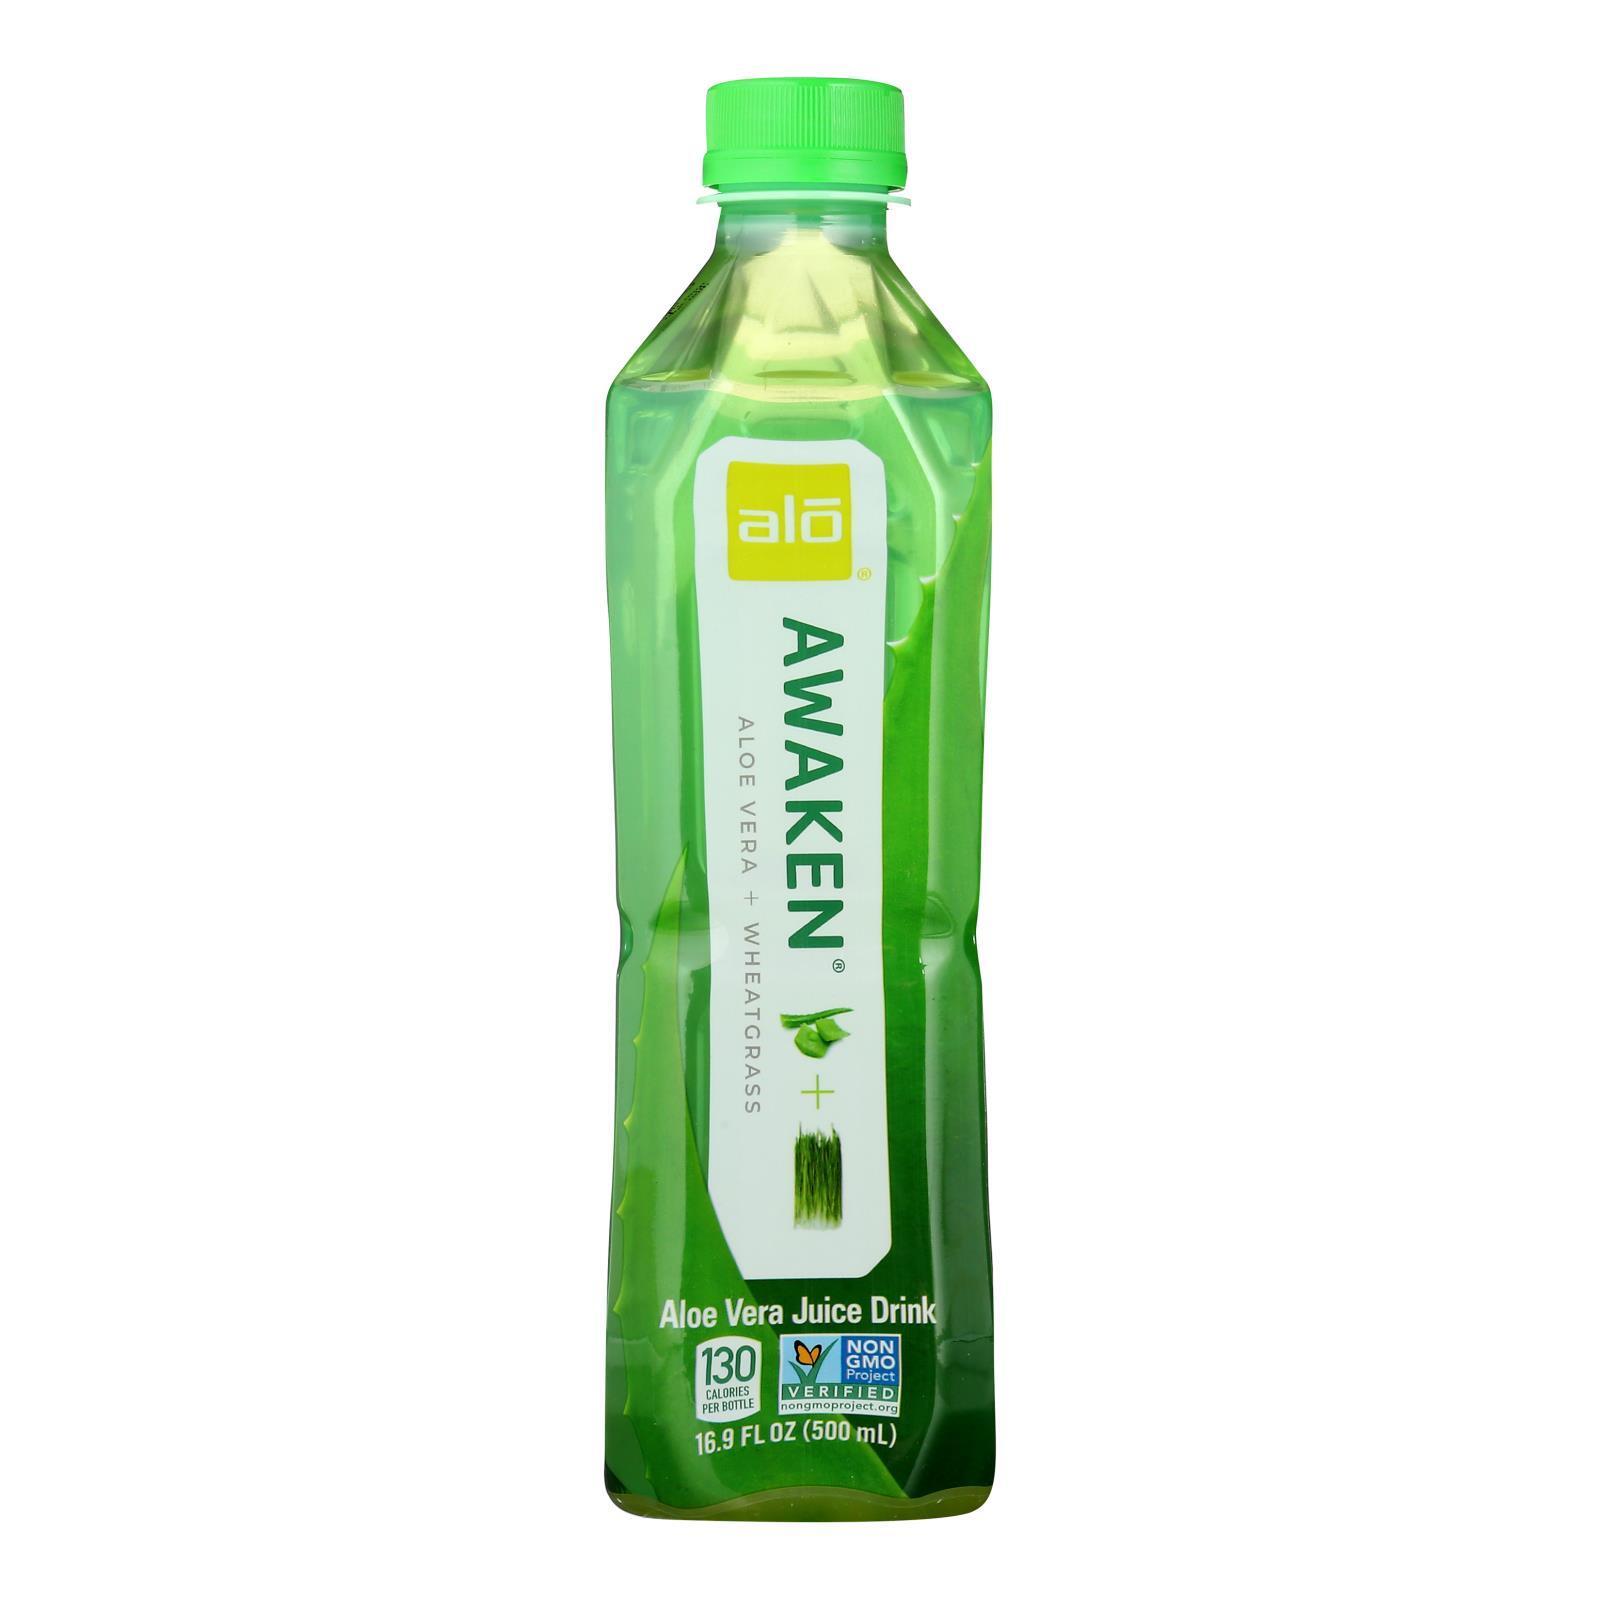 Alo Original Awaken Aloe Vera Juice Drink  - Wheatgrass - Case of 12 - 16.9 fl oz.